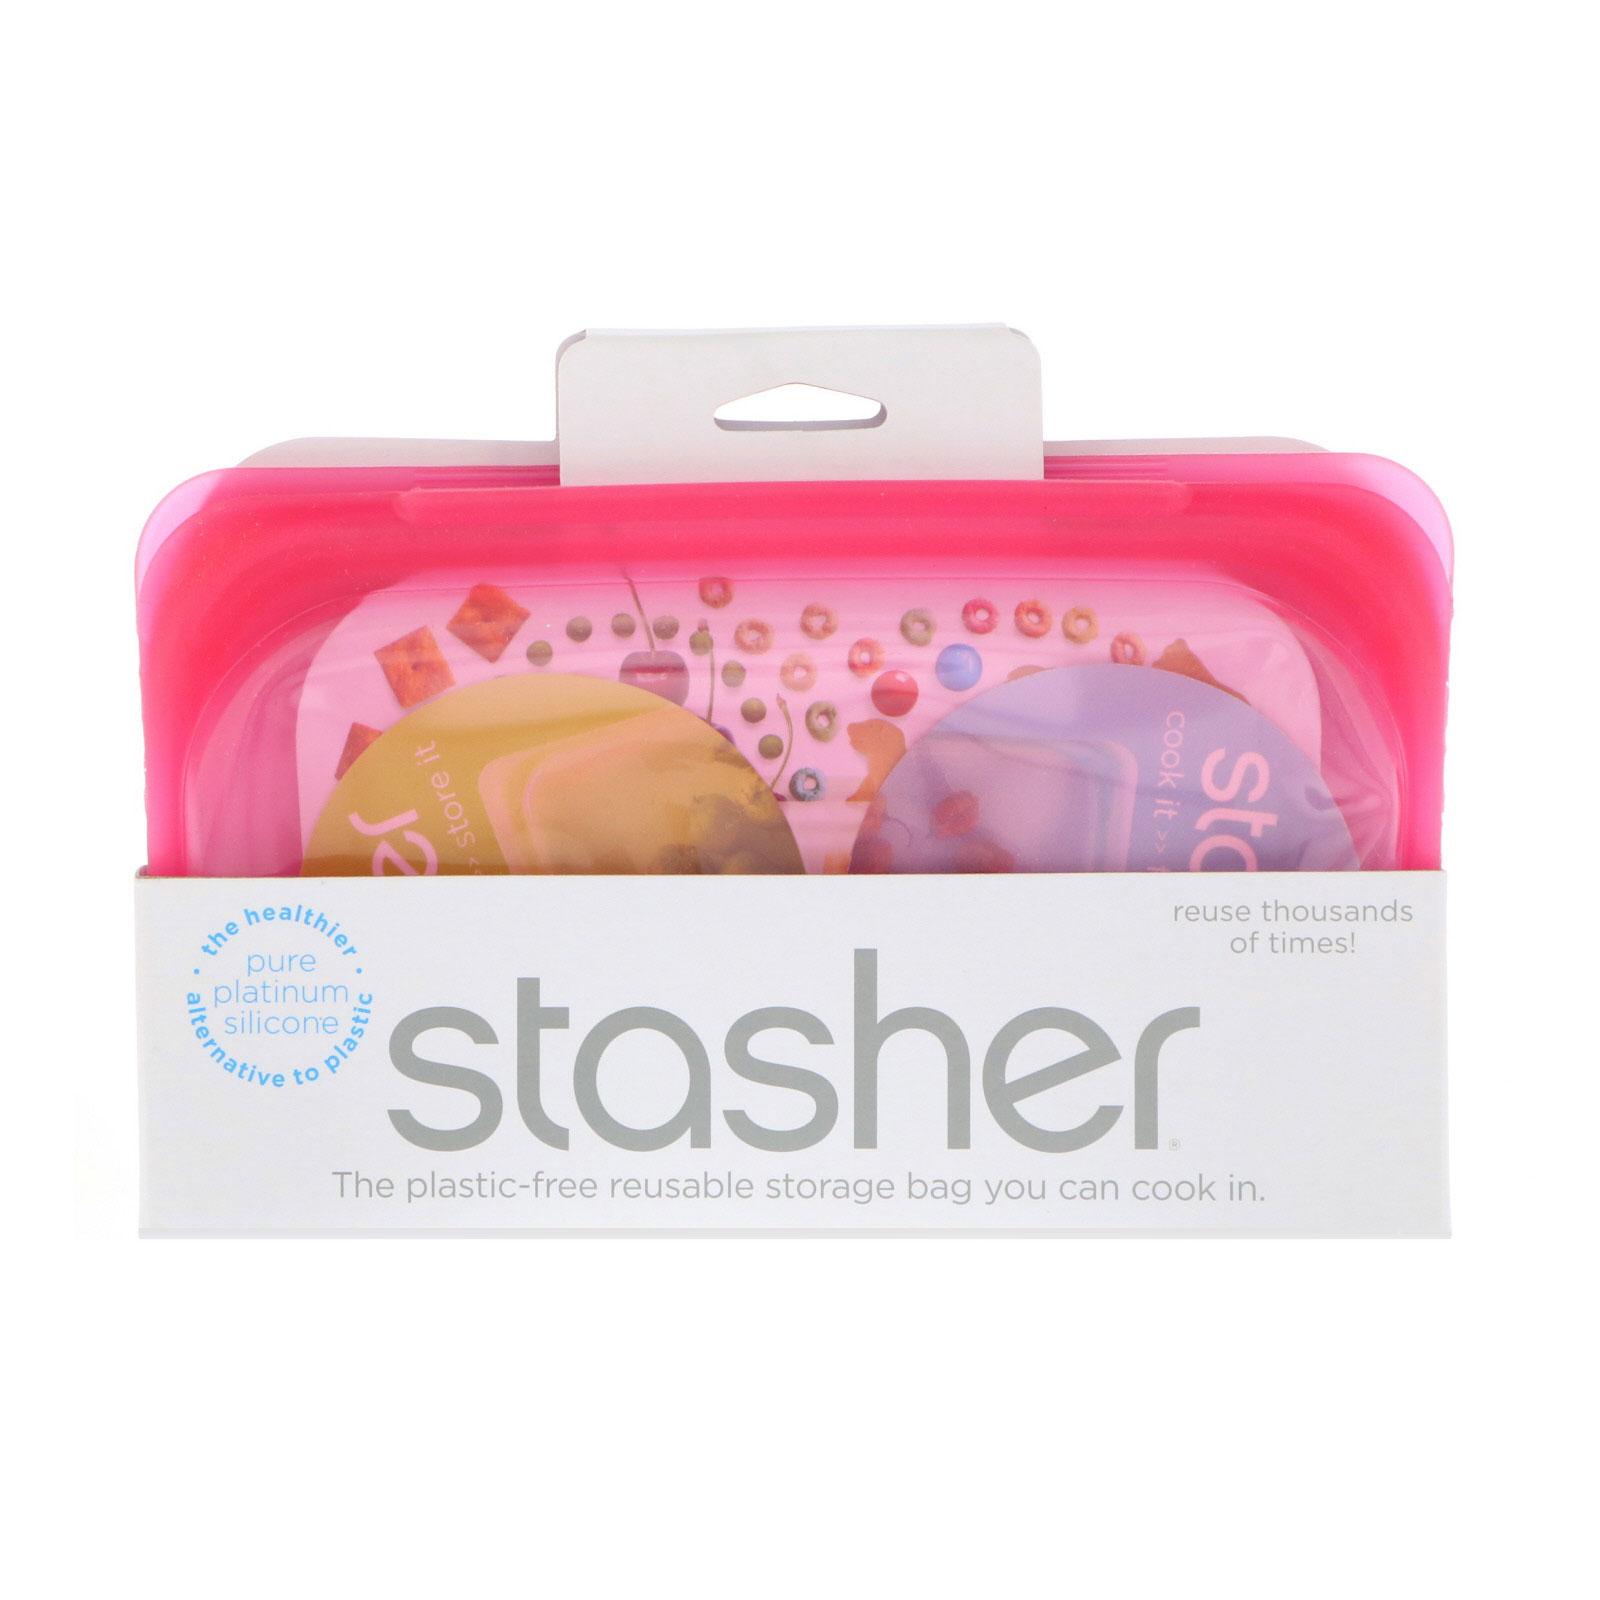 Stasher, Reusable Silicone Food Bag, Snack Size Small